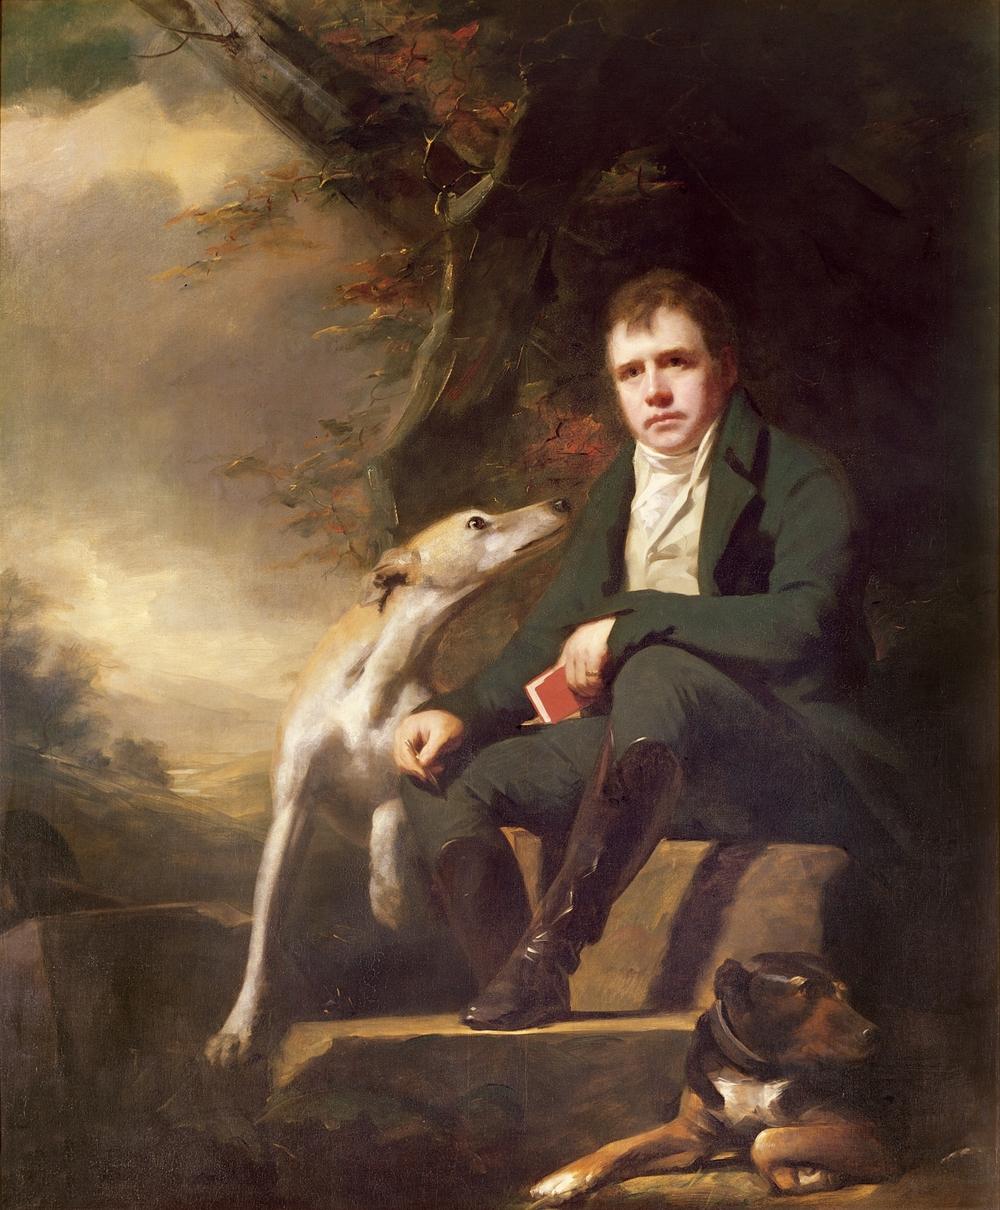 Henry Raeburn's portrait of Walter Scott and dogs (1823).